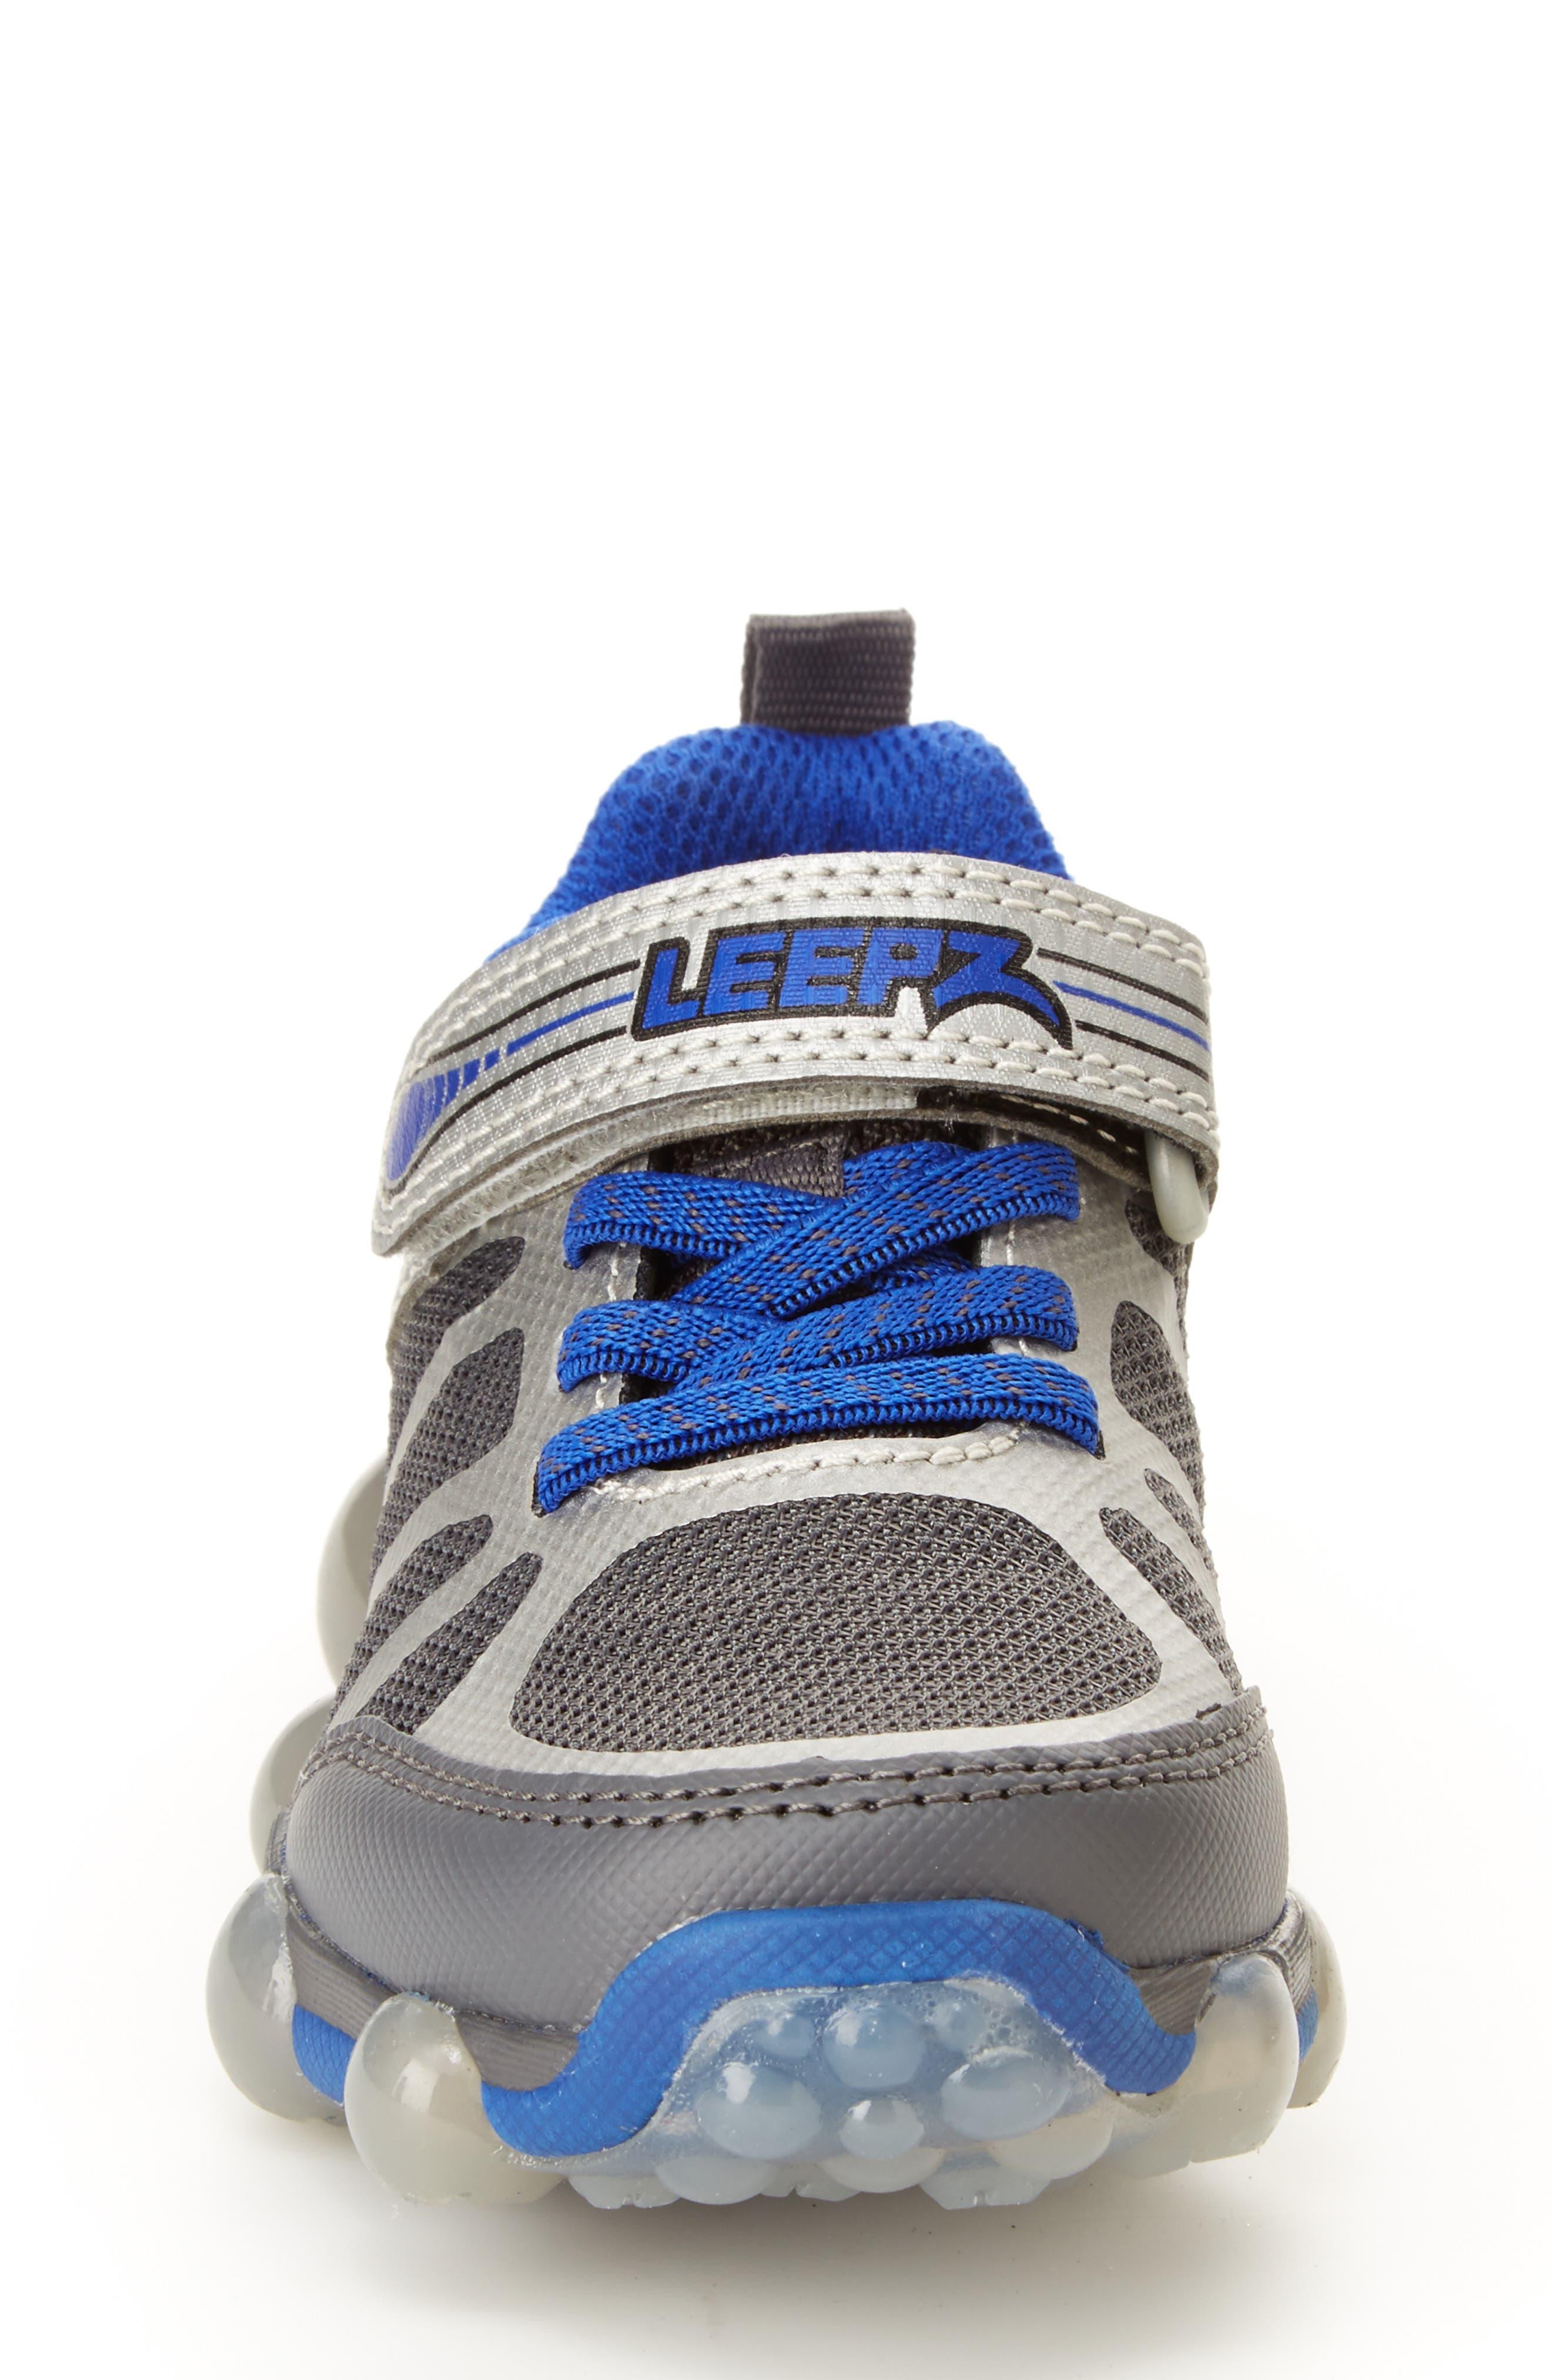 Leepz 3.0 Light-Up Sneaker,                             Alternate thumbnail 3, color,                             DARK GREY/ BLUE